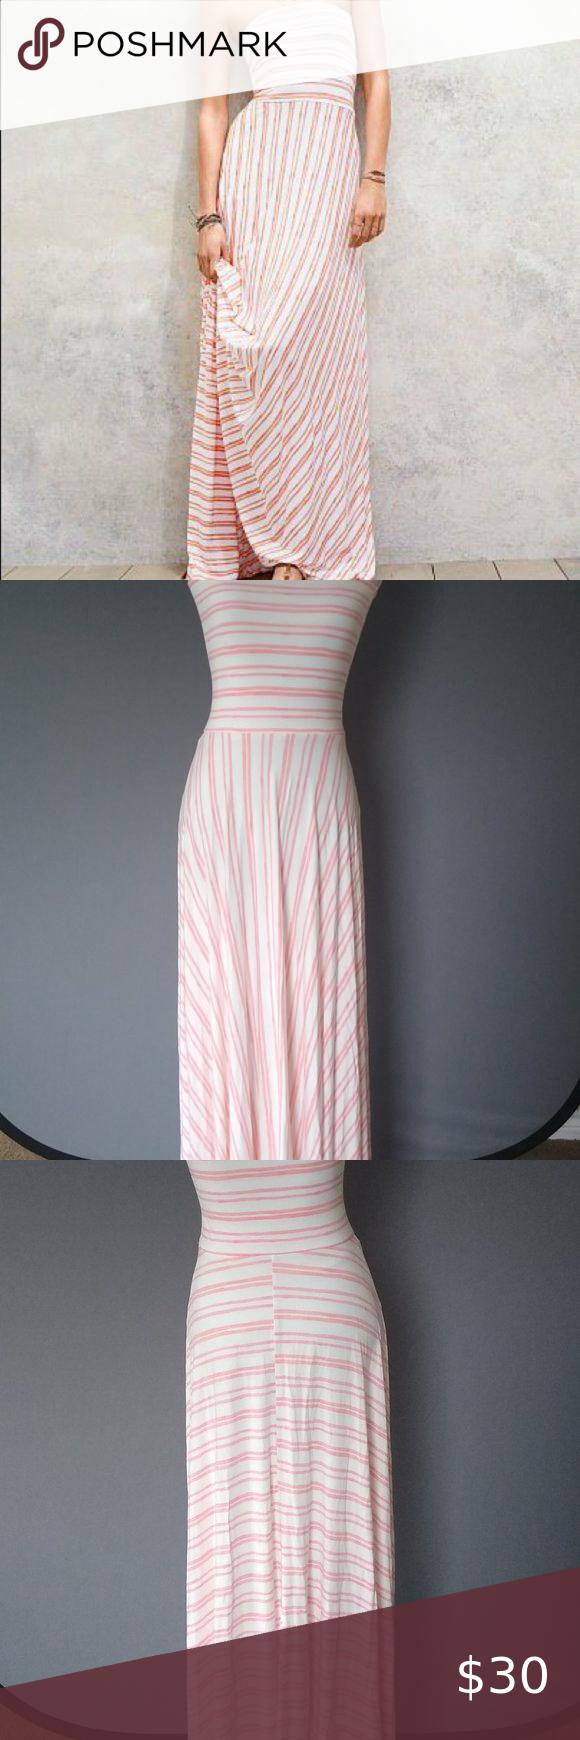 Victoria S Secret Striped Fold Over Multi Way Maxi Striped Maxi Dresses Tea Length Dresses Victoria Secret [ 1740 x 580 Pixel ]